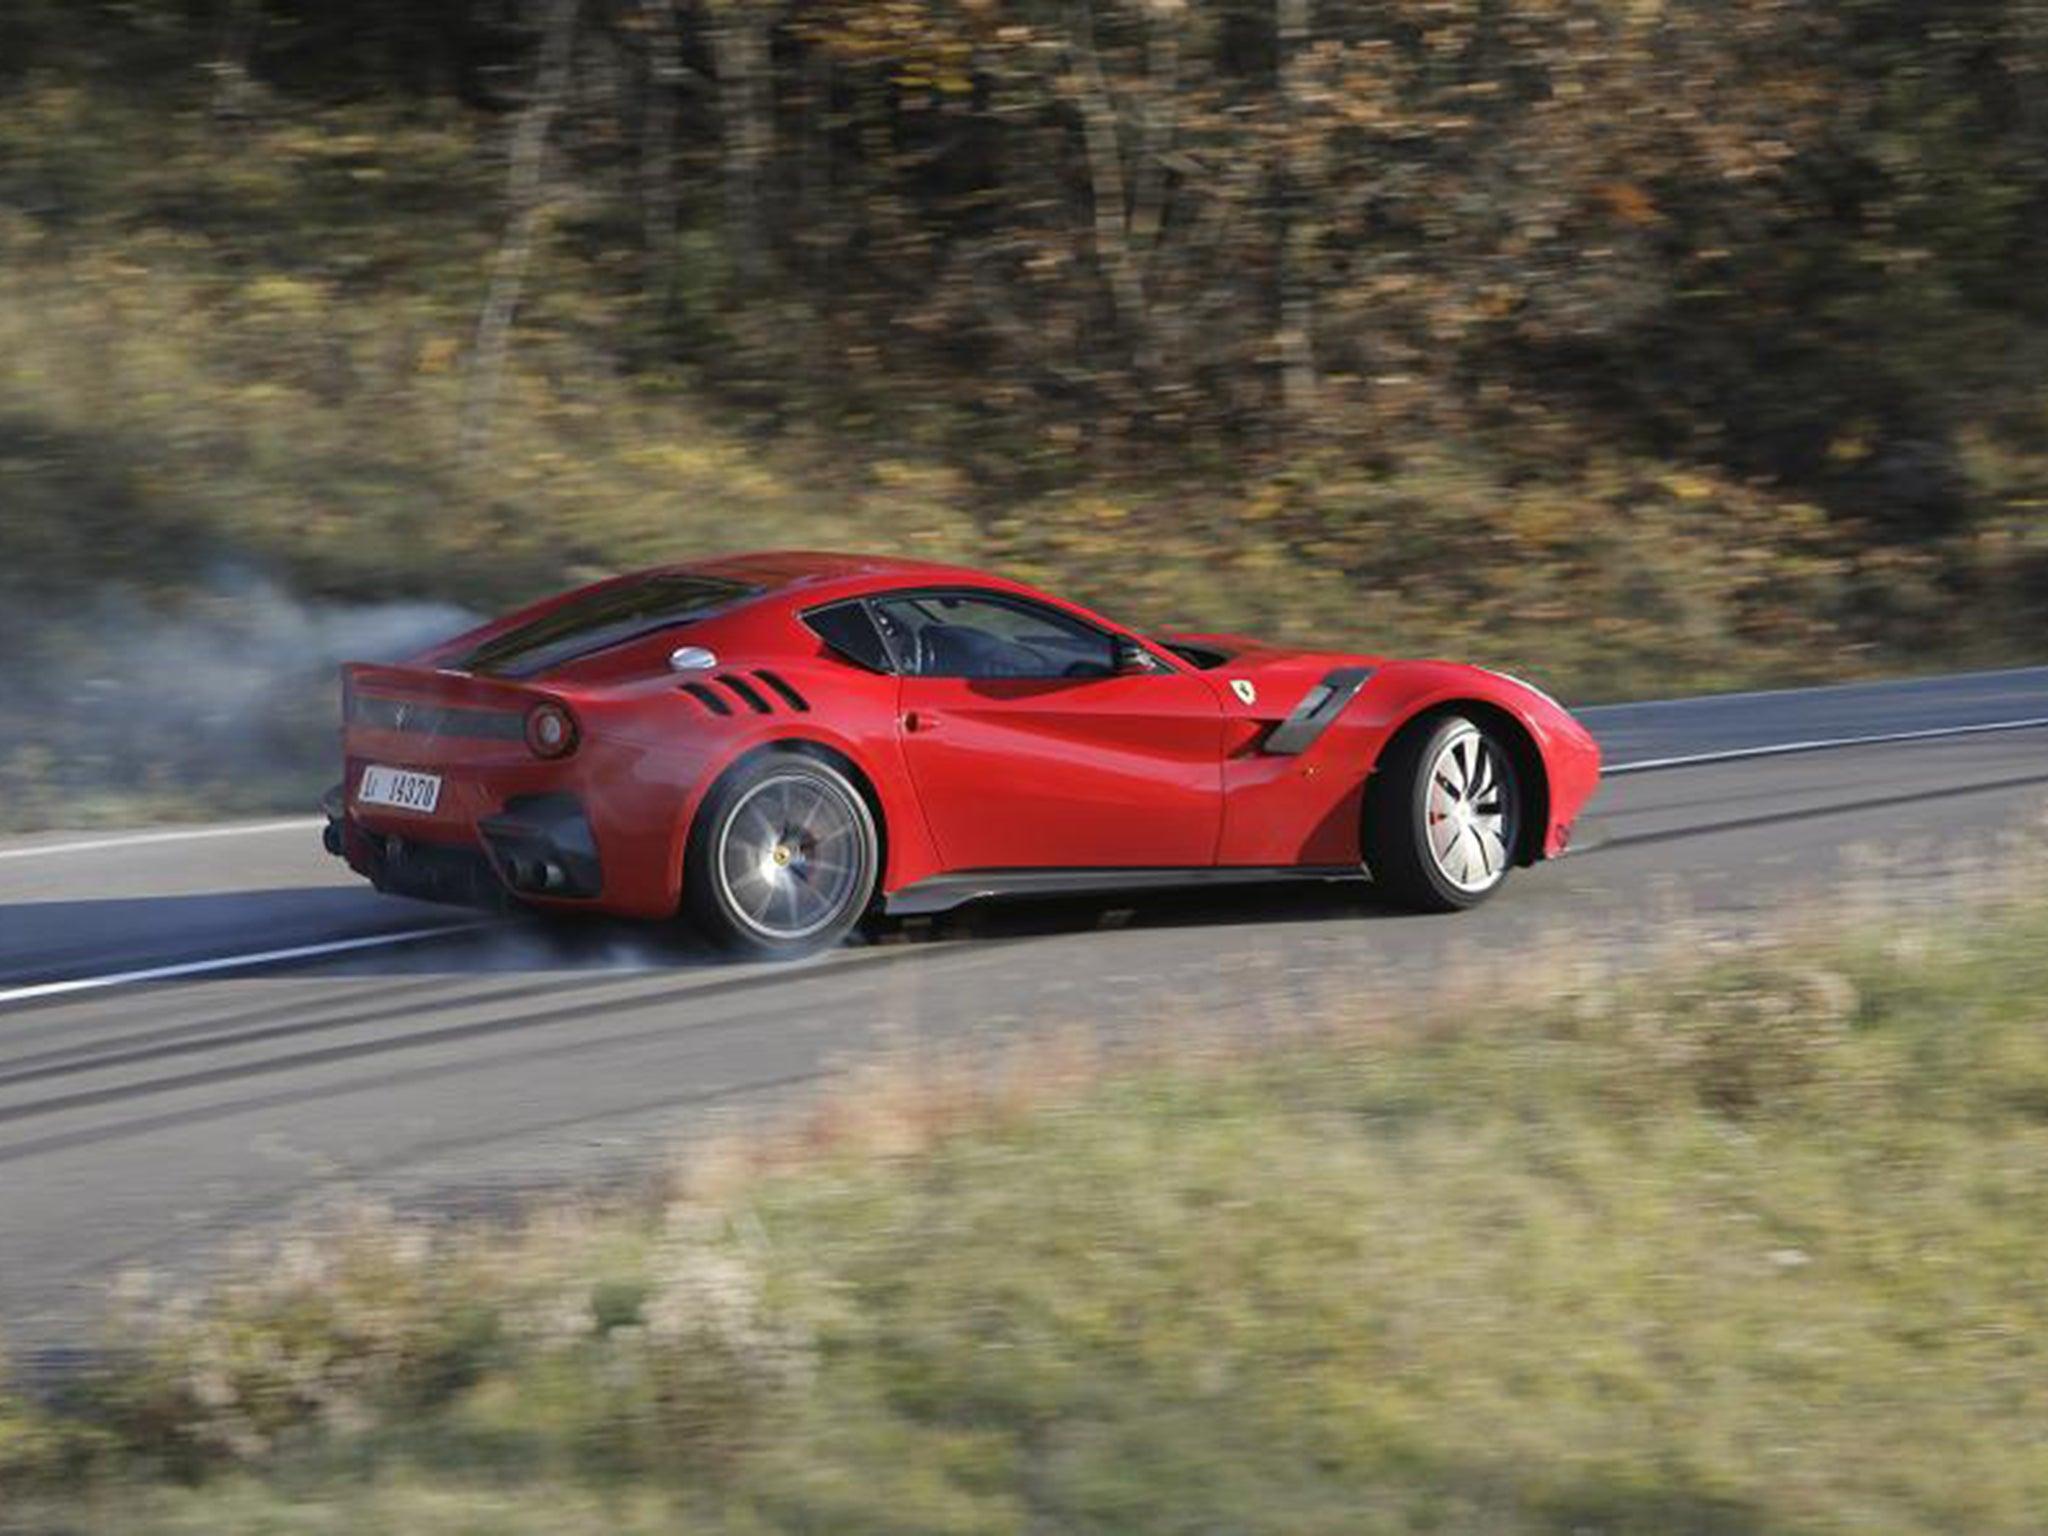 Ferrari F12 TdF, car review: For when an F12's 730bhp just